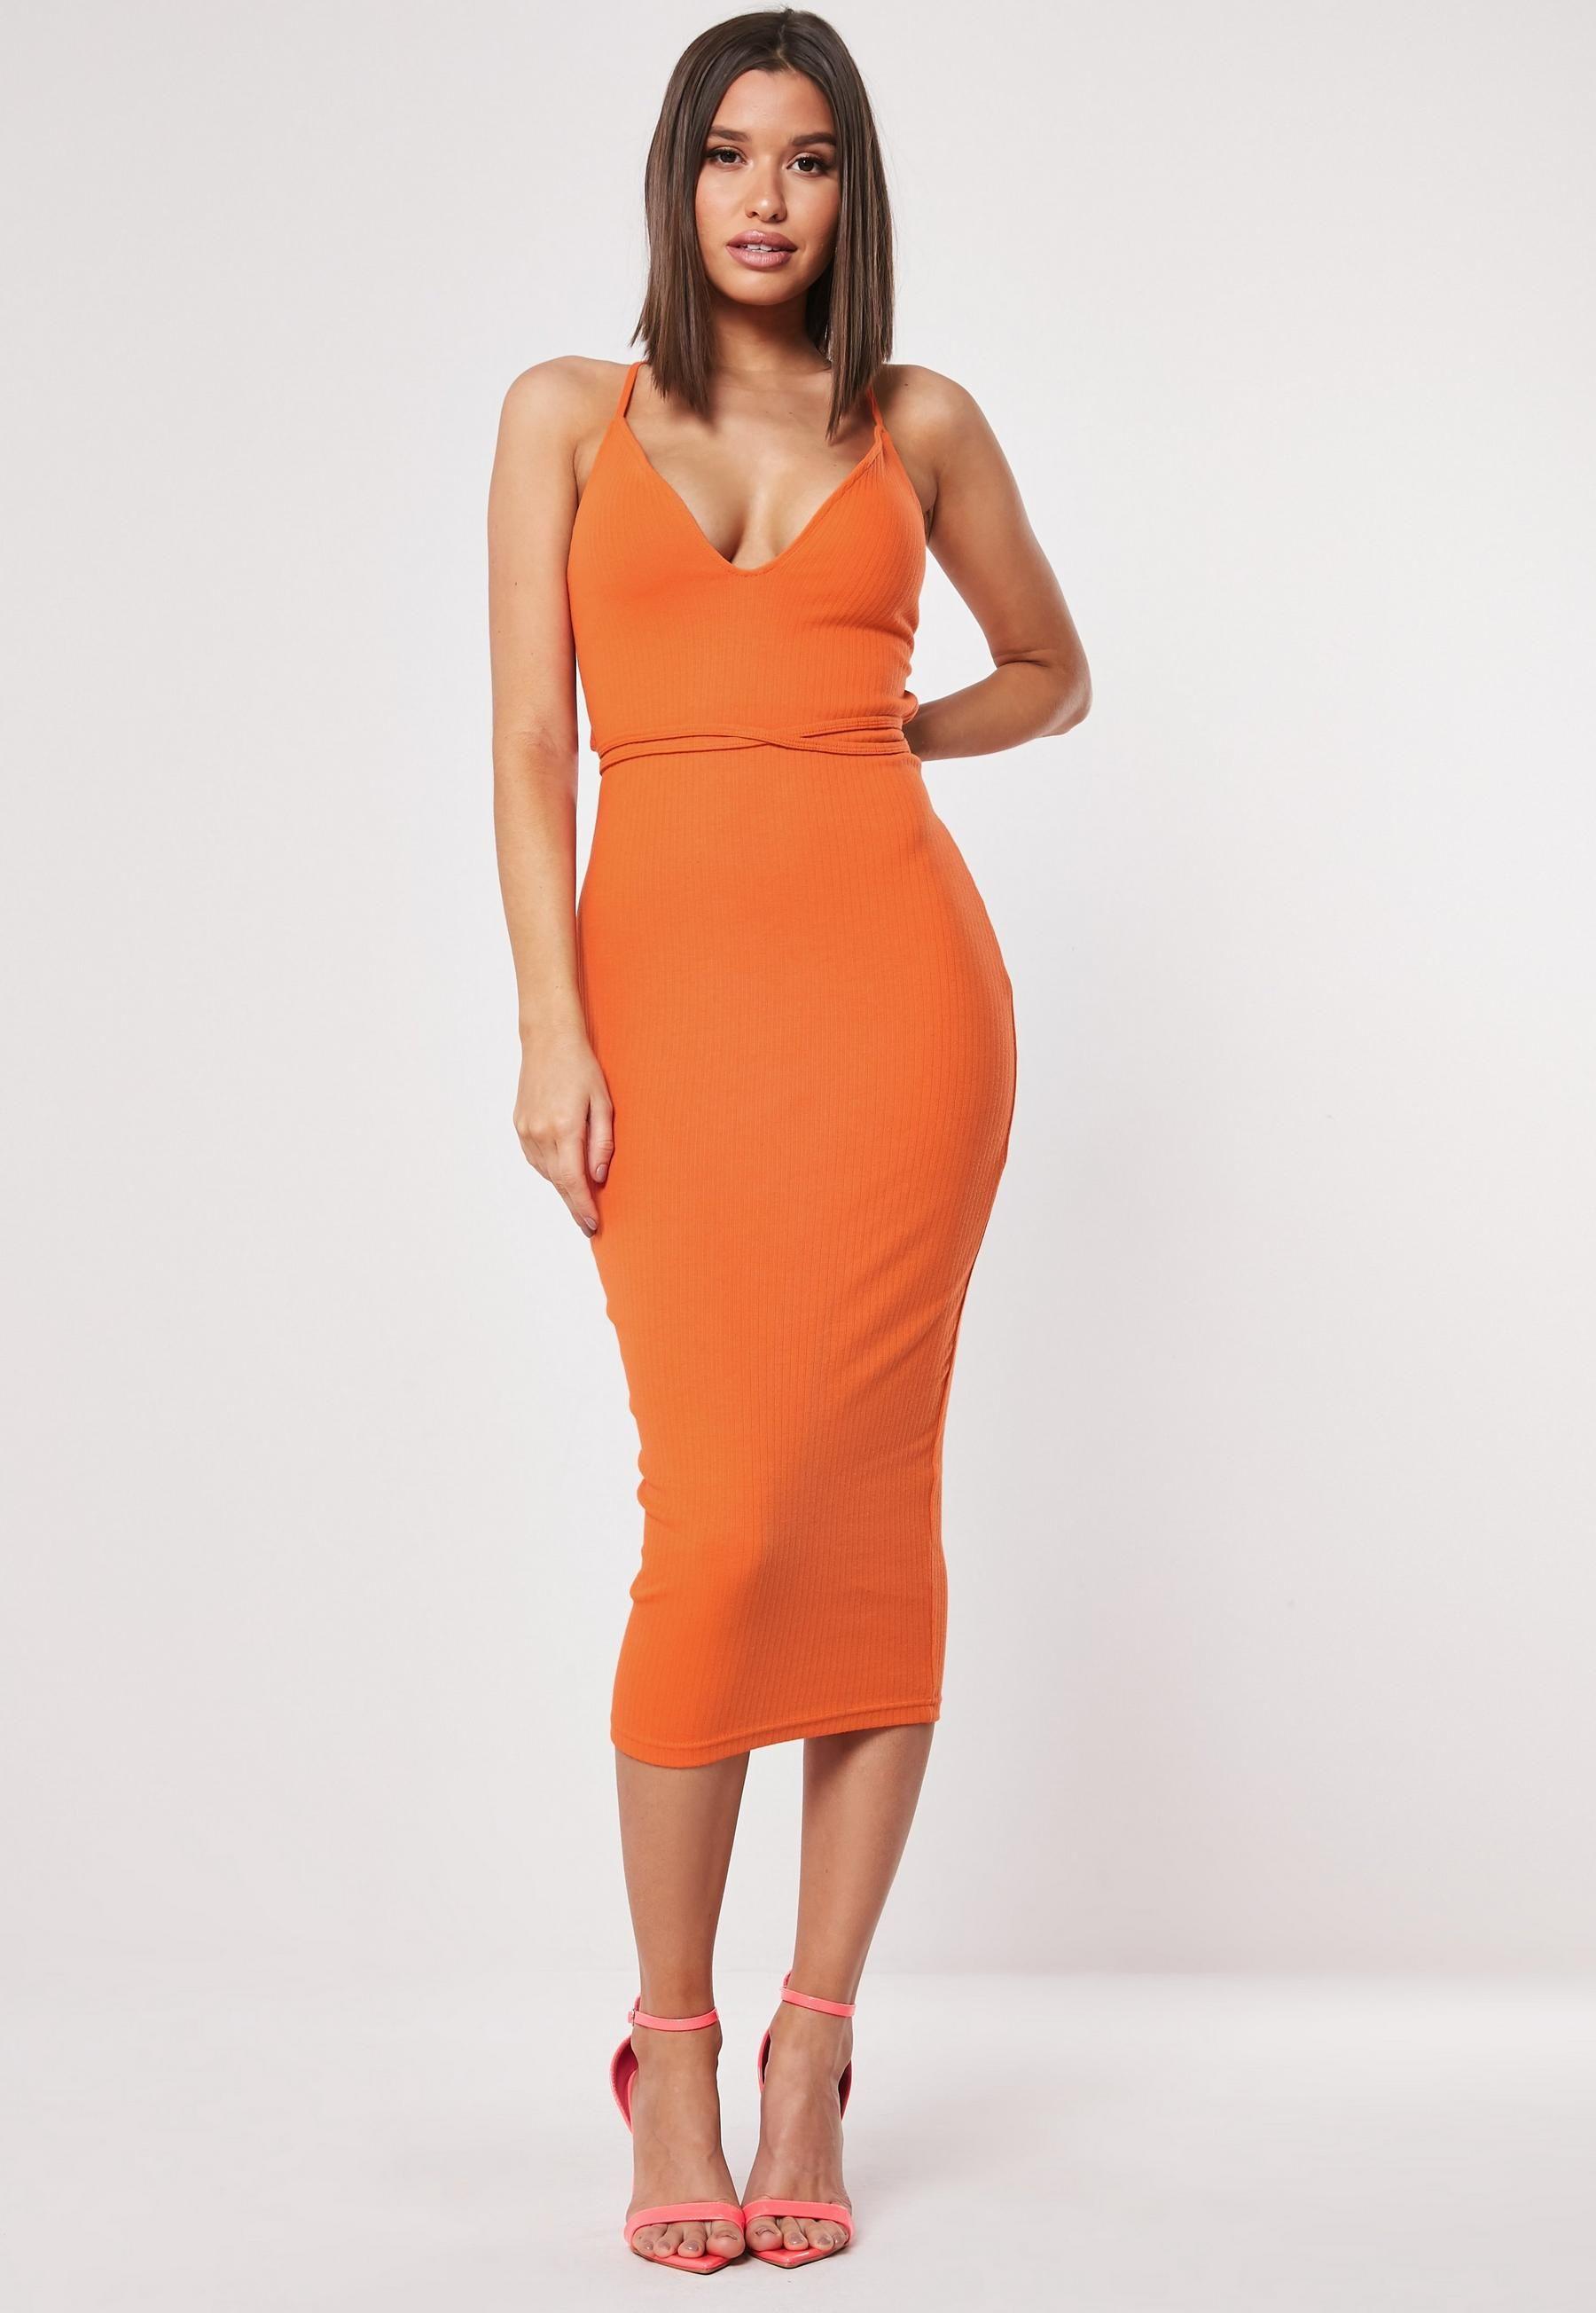 Orange Ribbed Multiway Strap Midi Dress Missguided Chic Bodycon Dress Knee Length Midi Dresses Dresses [ 2608 x 1800 Pixel ]